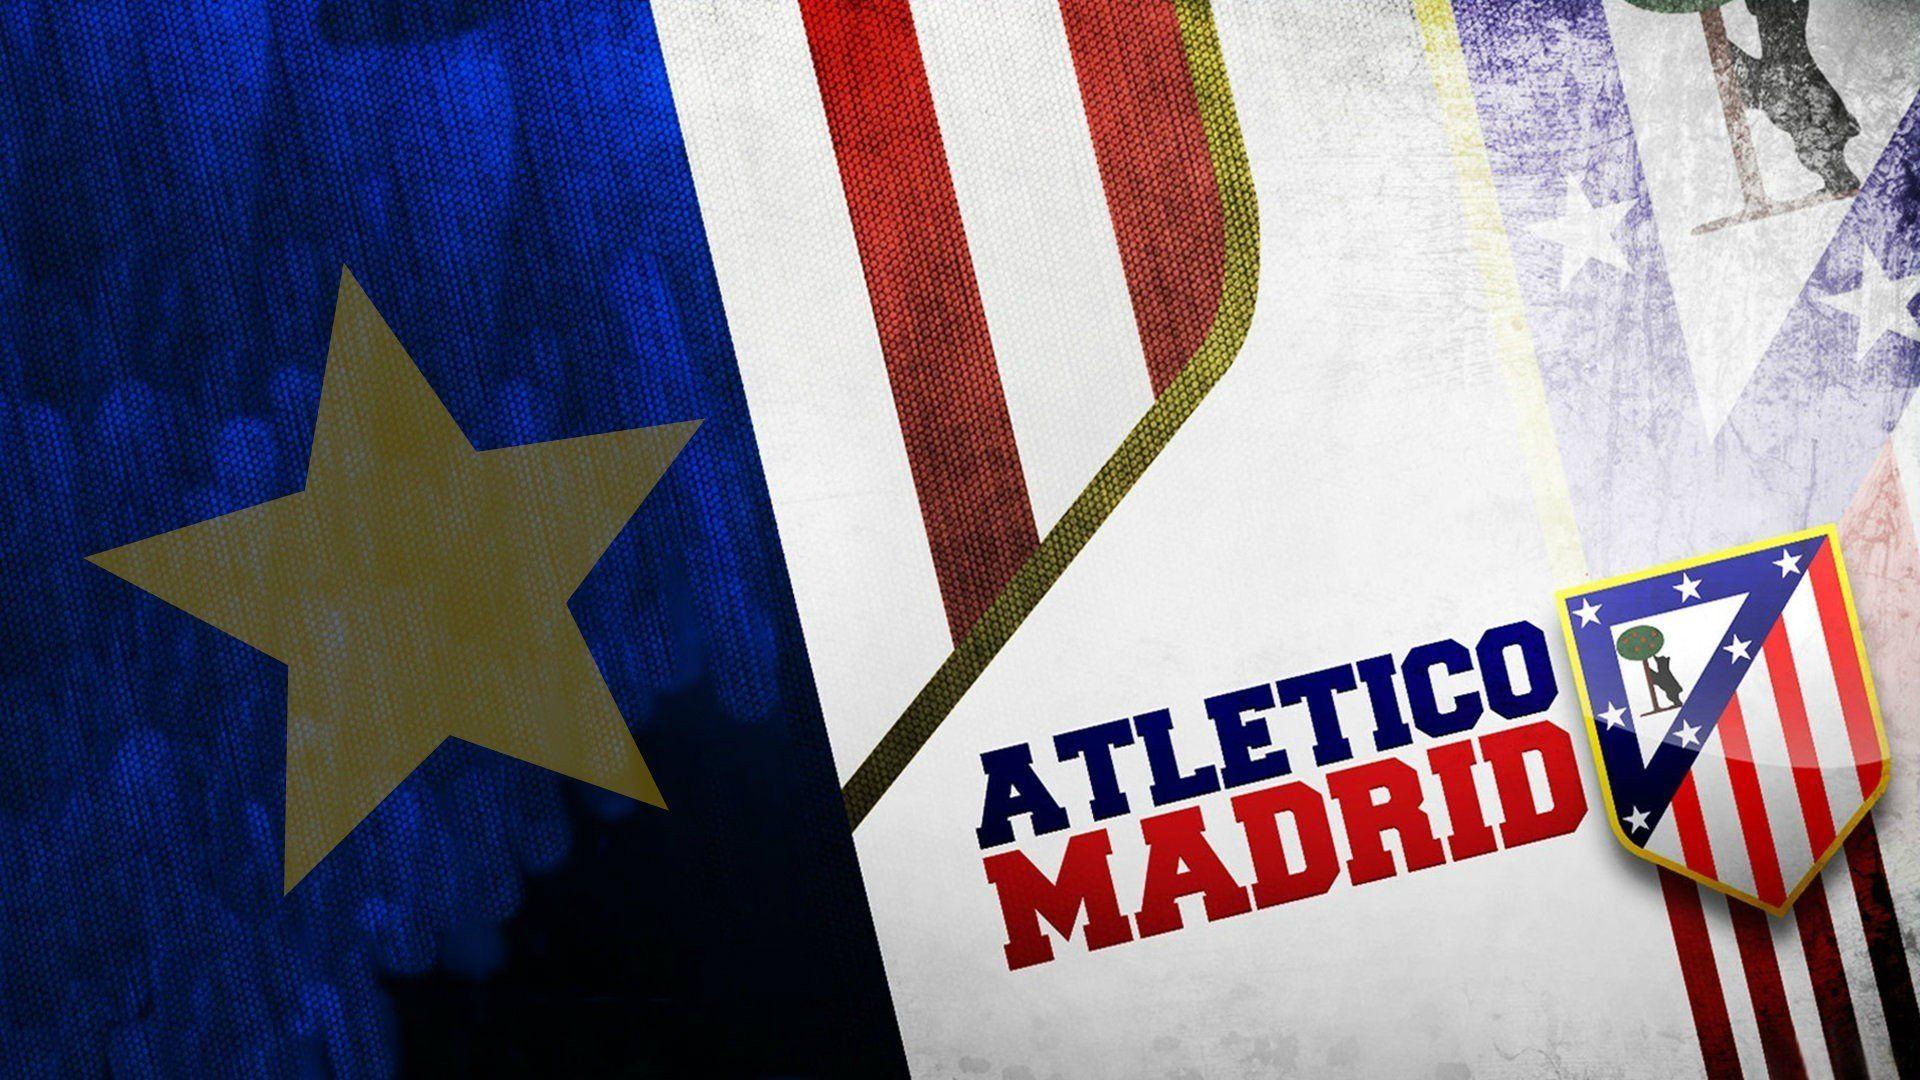 HD Atletico Madrid Logo Wallpaper 1920x1080